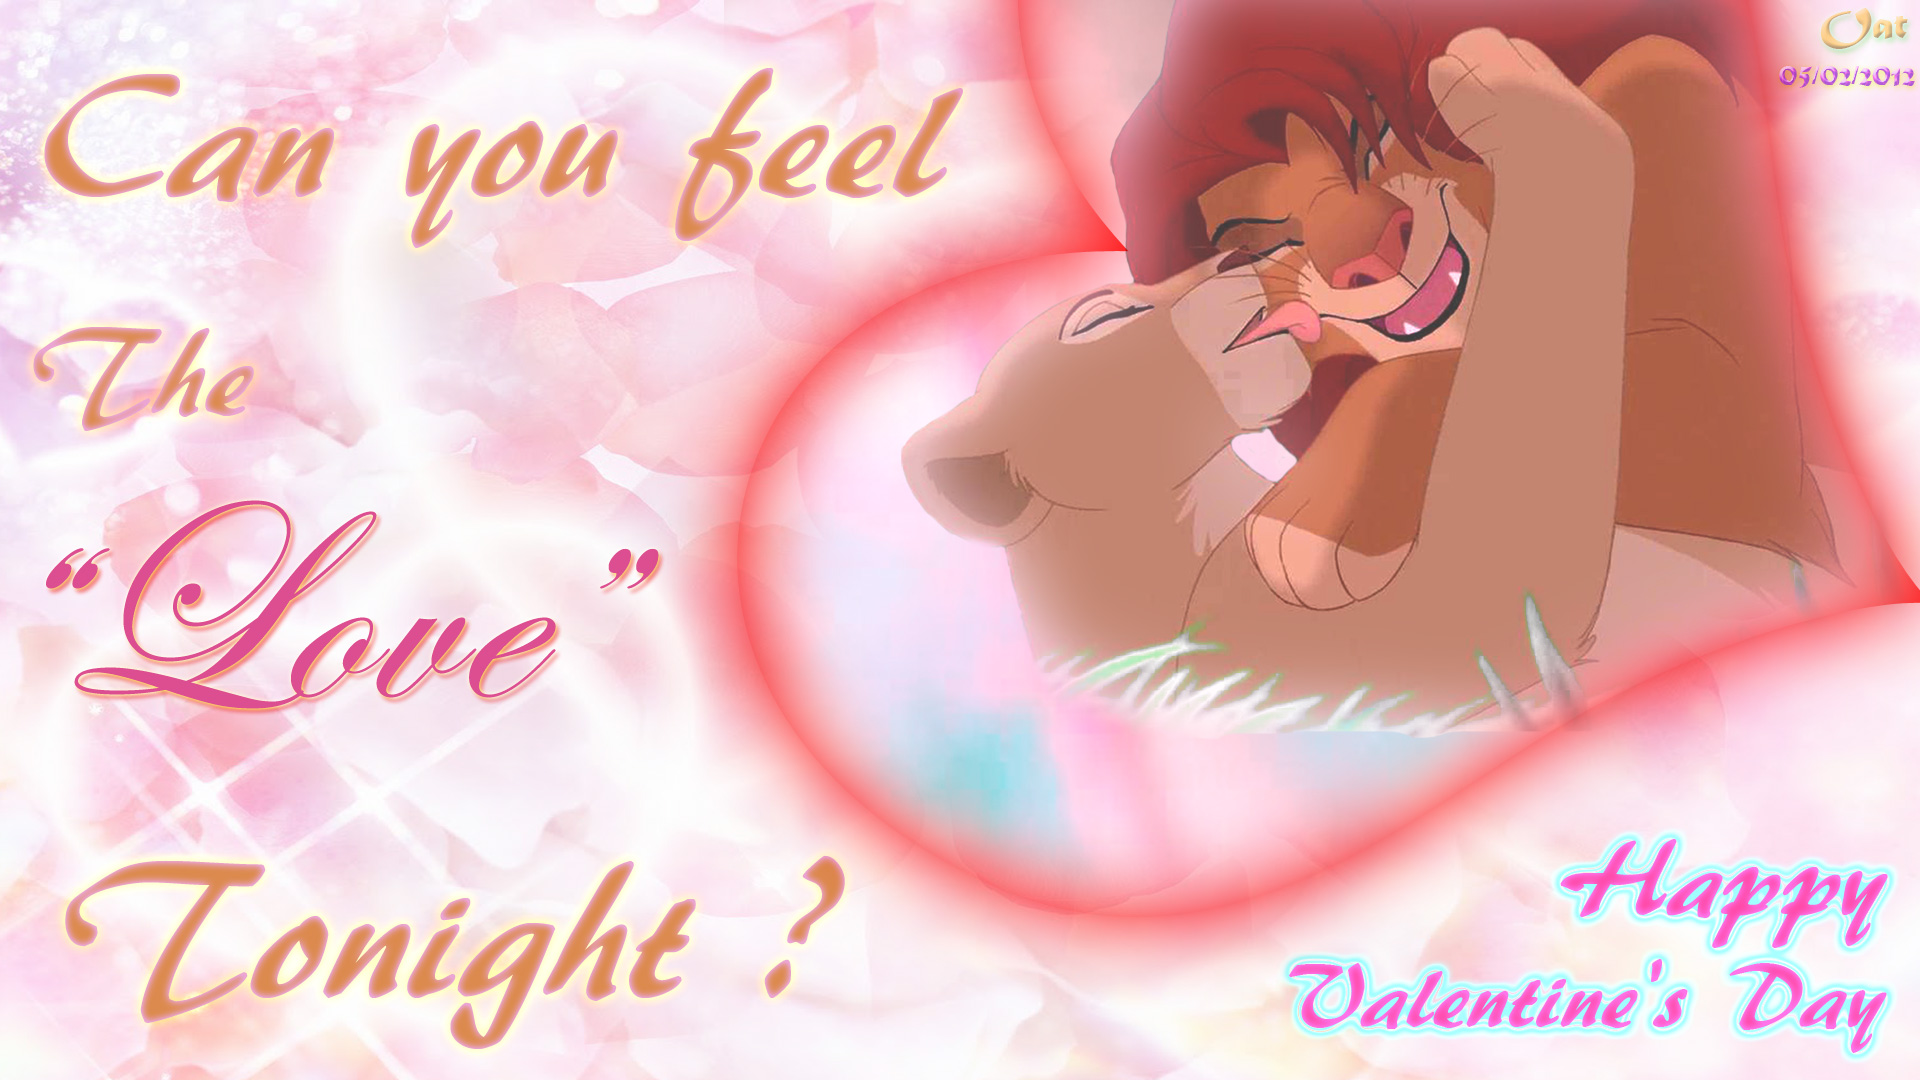 Disney Couples   Disney Valentines Day Wallpaper 34476700 1920x1080